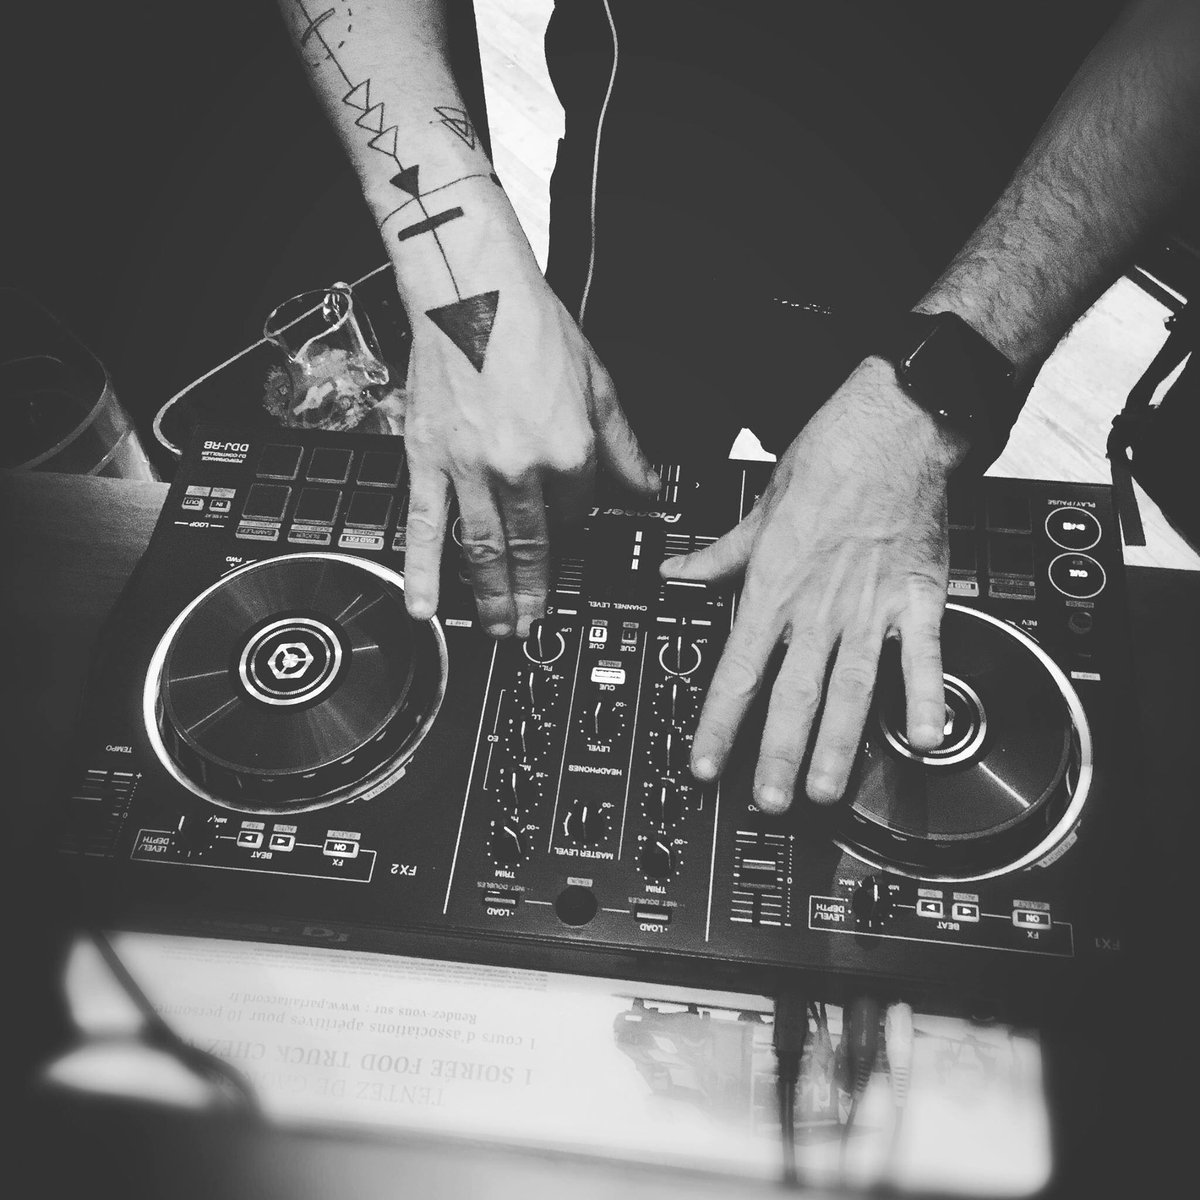 Ce soir #djset #deephouse #minimal #electro #lounge #aubureau #paris #champselyses set by @ThomasBretey<br>http://pic.twitter.com/aE5HKGxpc0